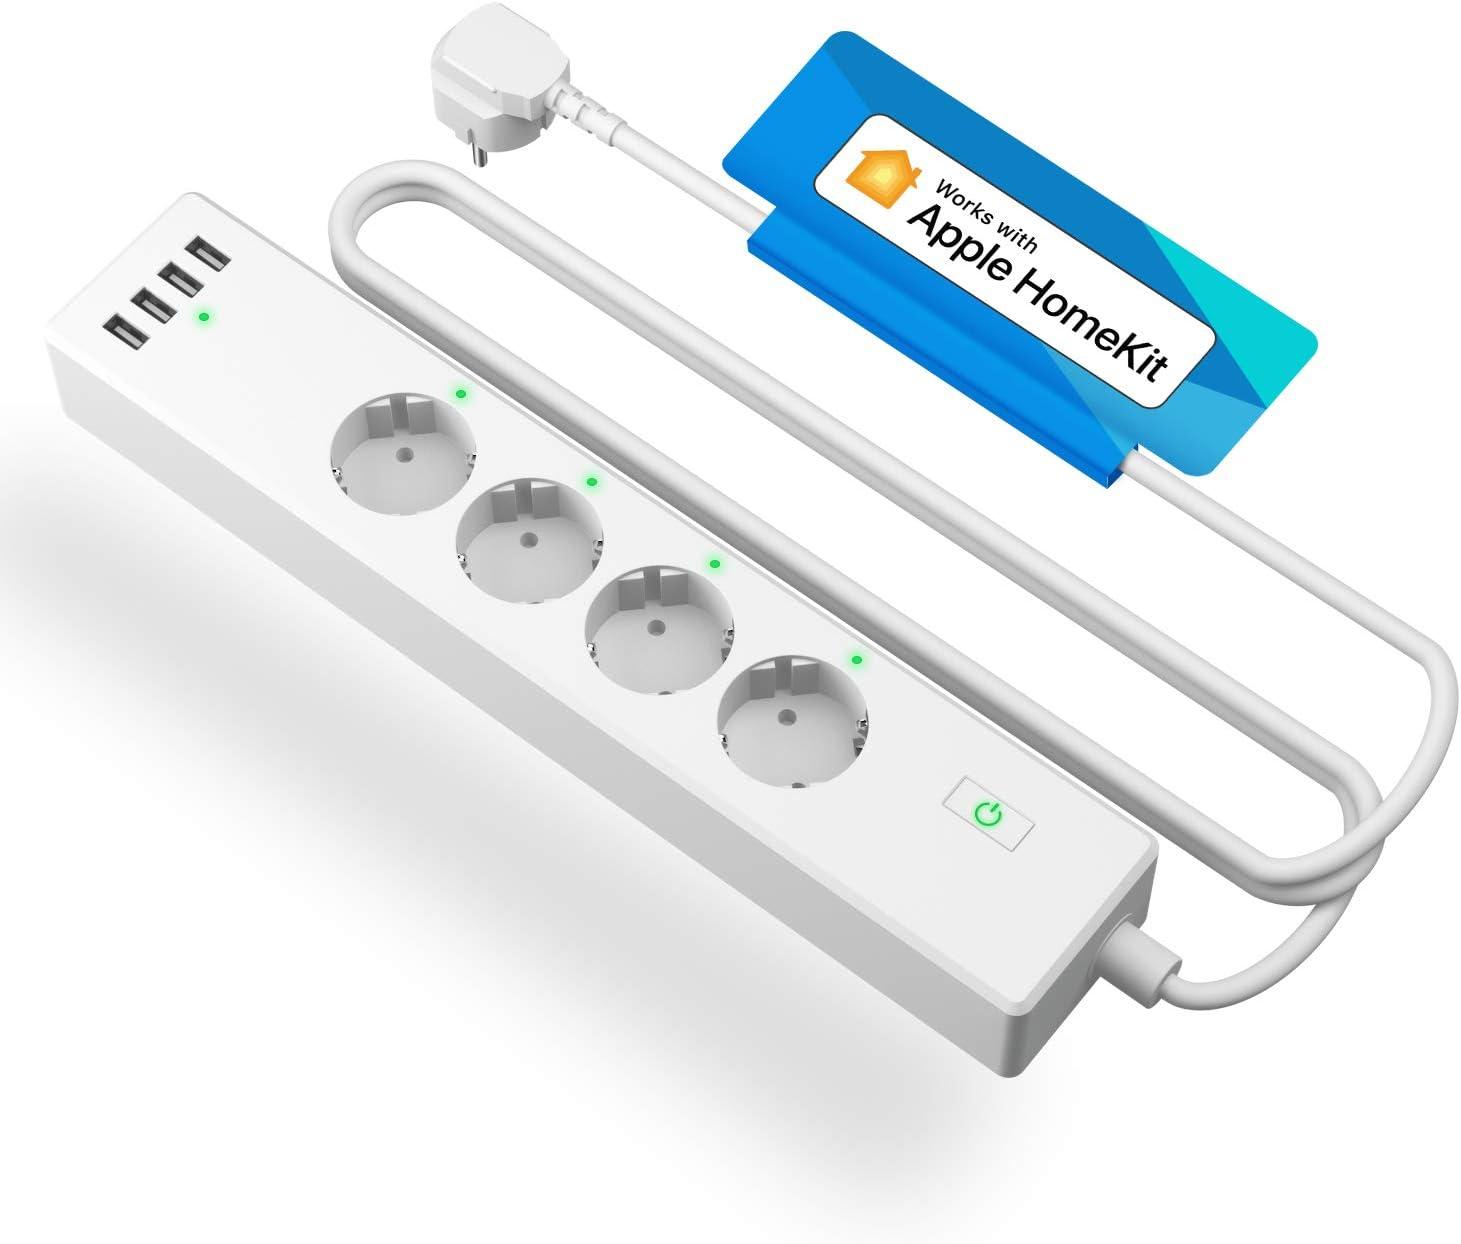 Multiprise Connectée HomeKit (Type F), Multiprise Intelligente Compatible avec Apple HomeKit, Siri,...